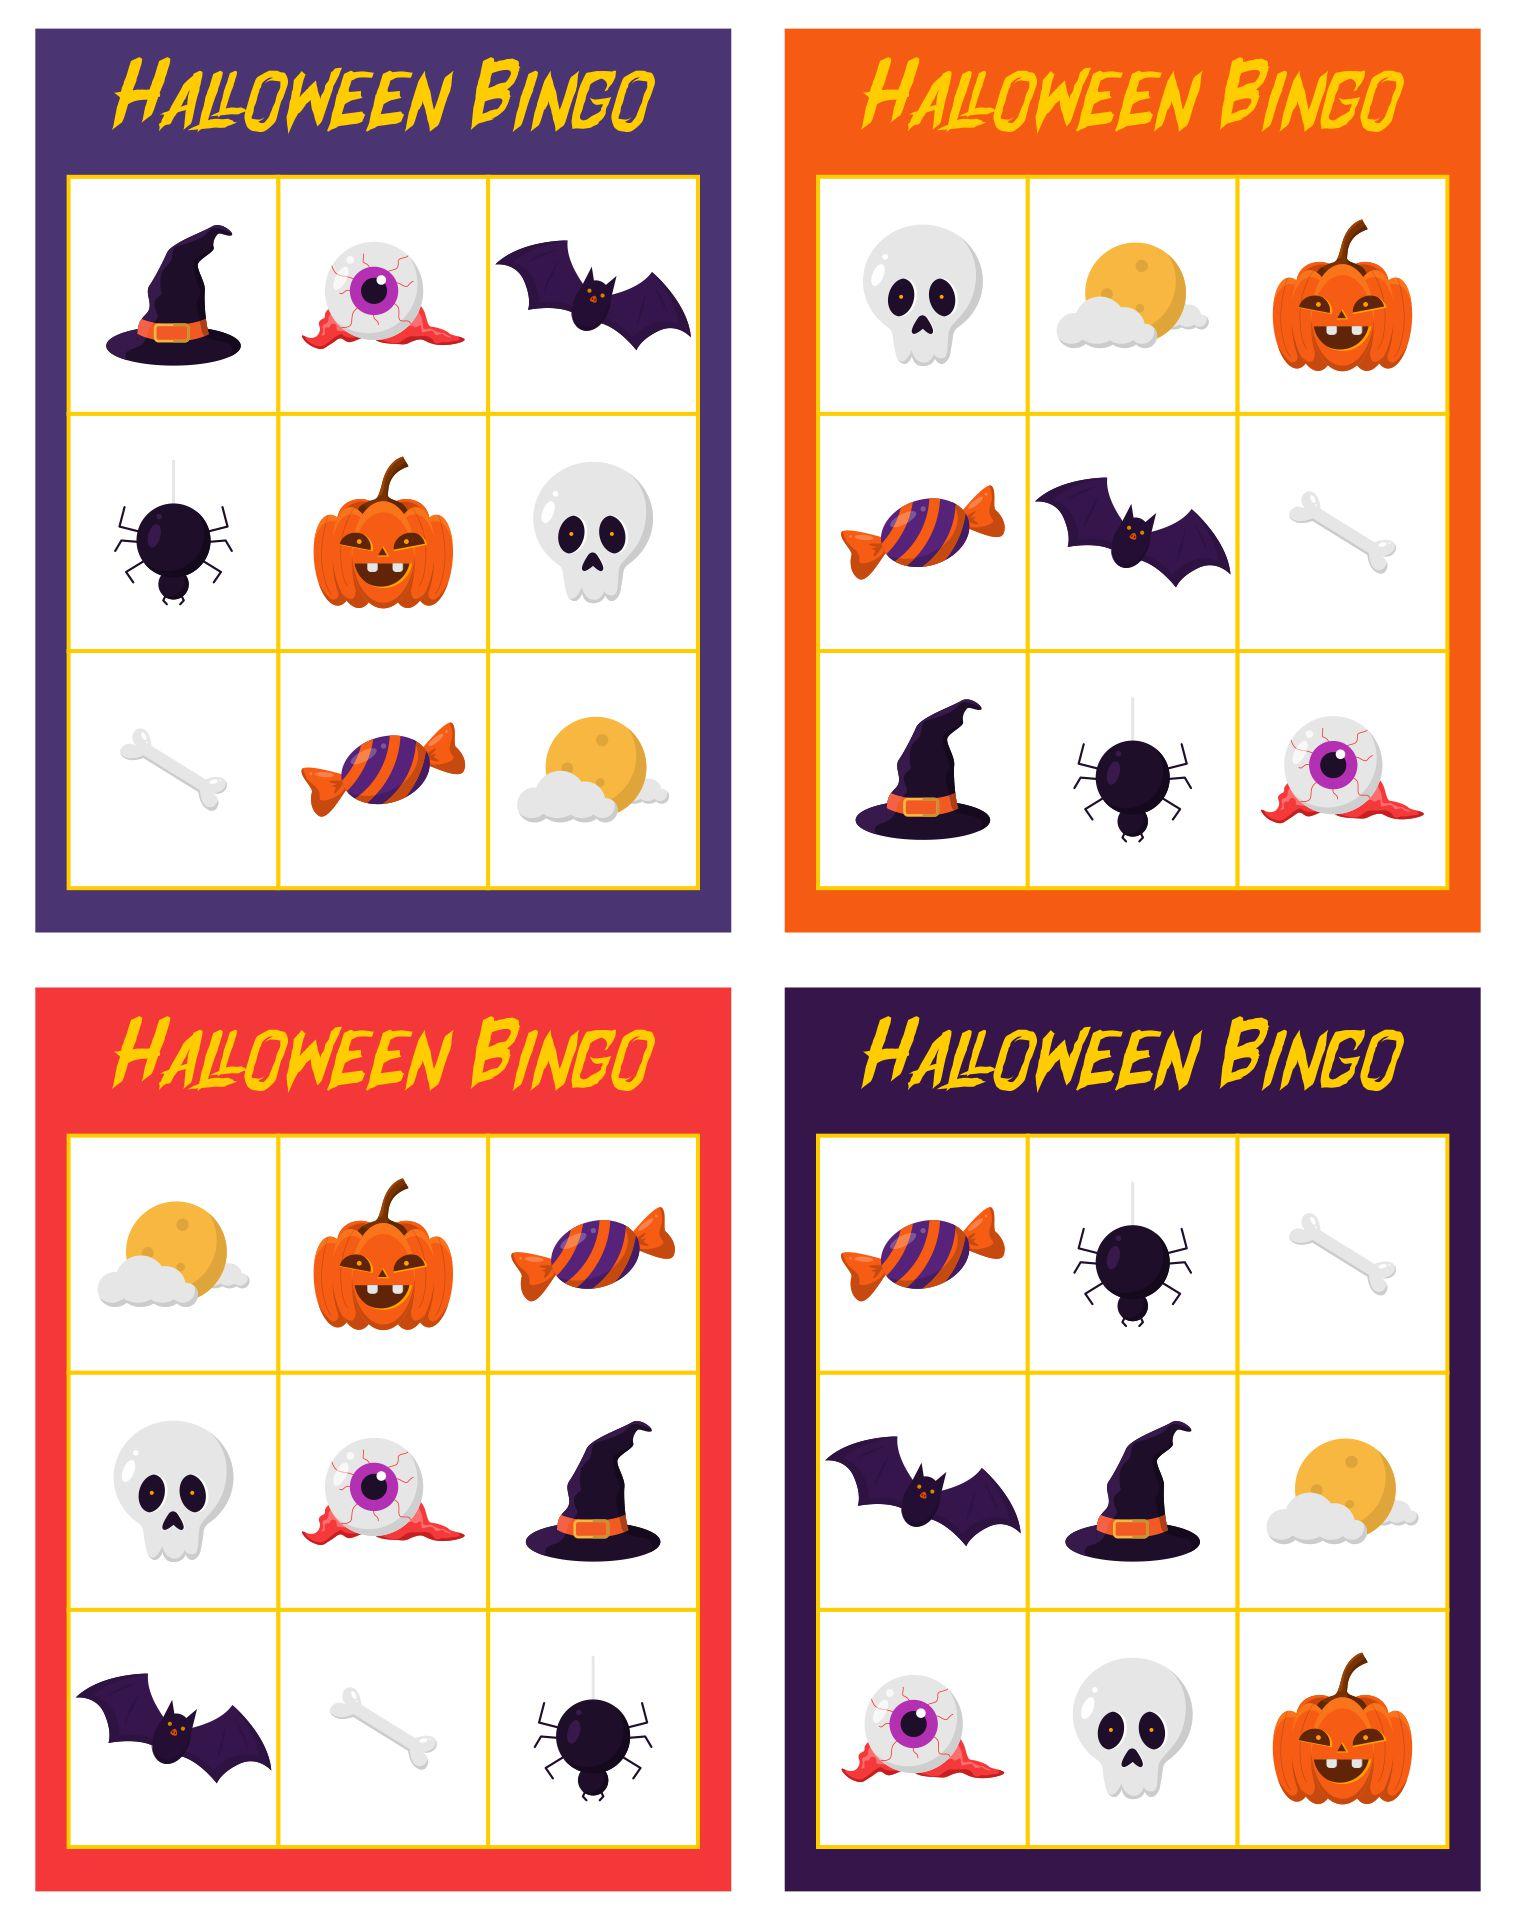 Free Printable Halloween Bingo Game Cards